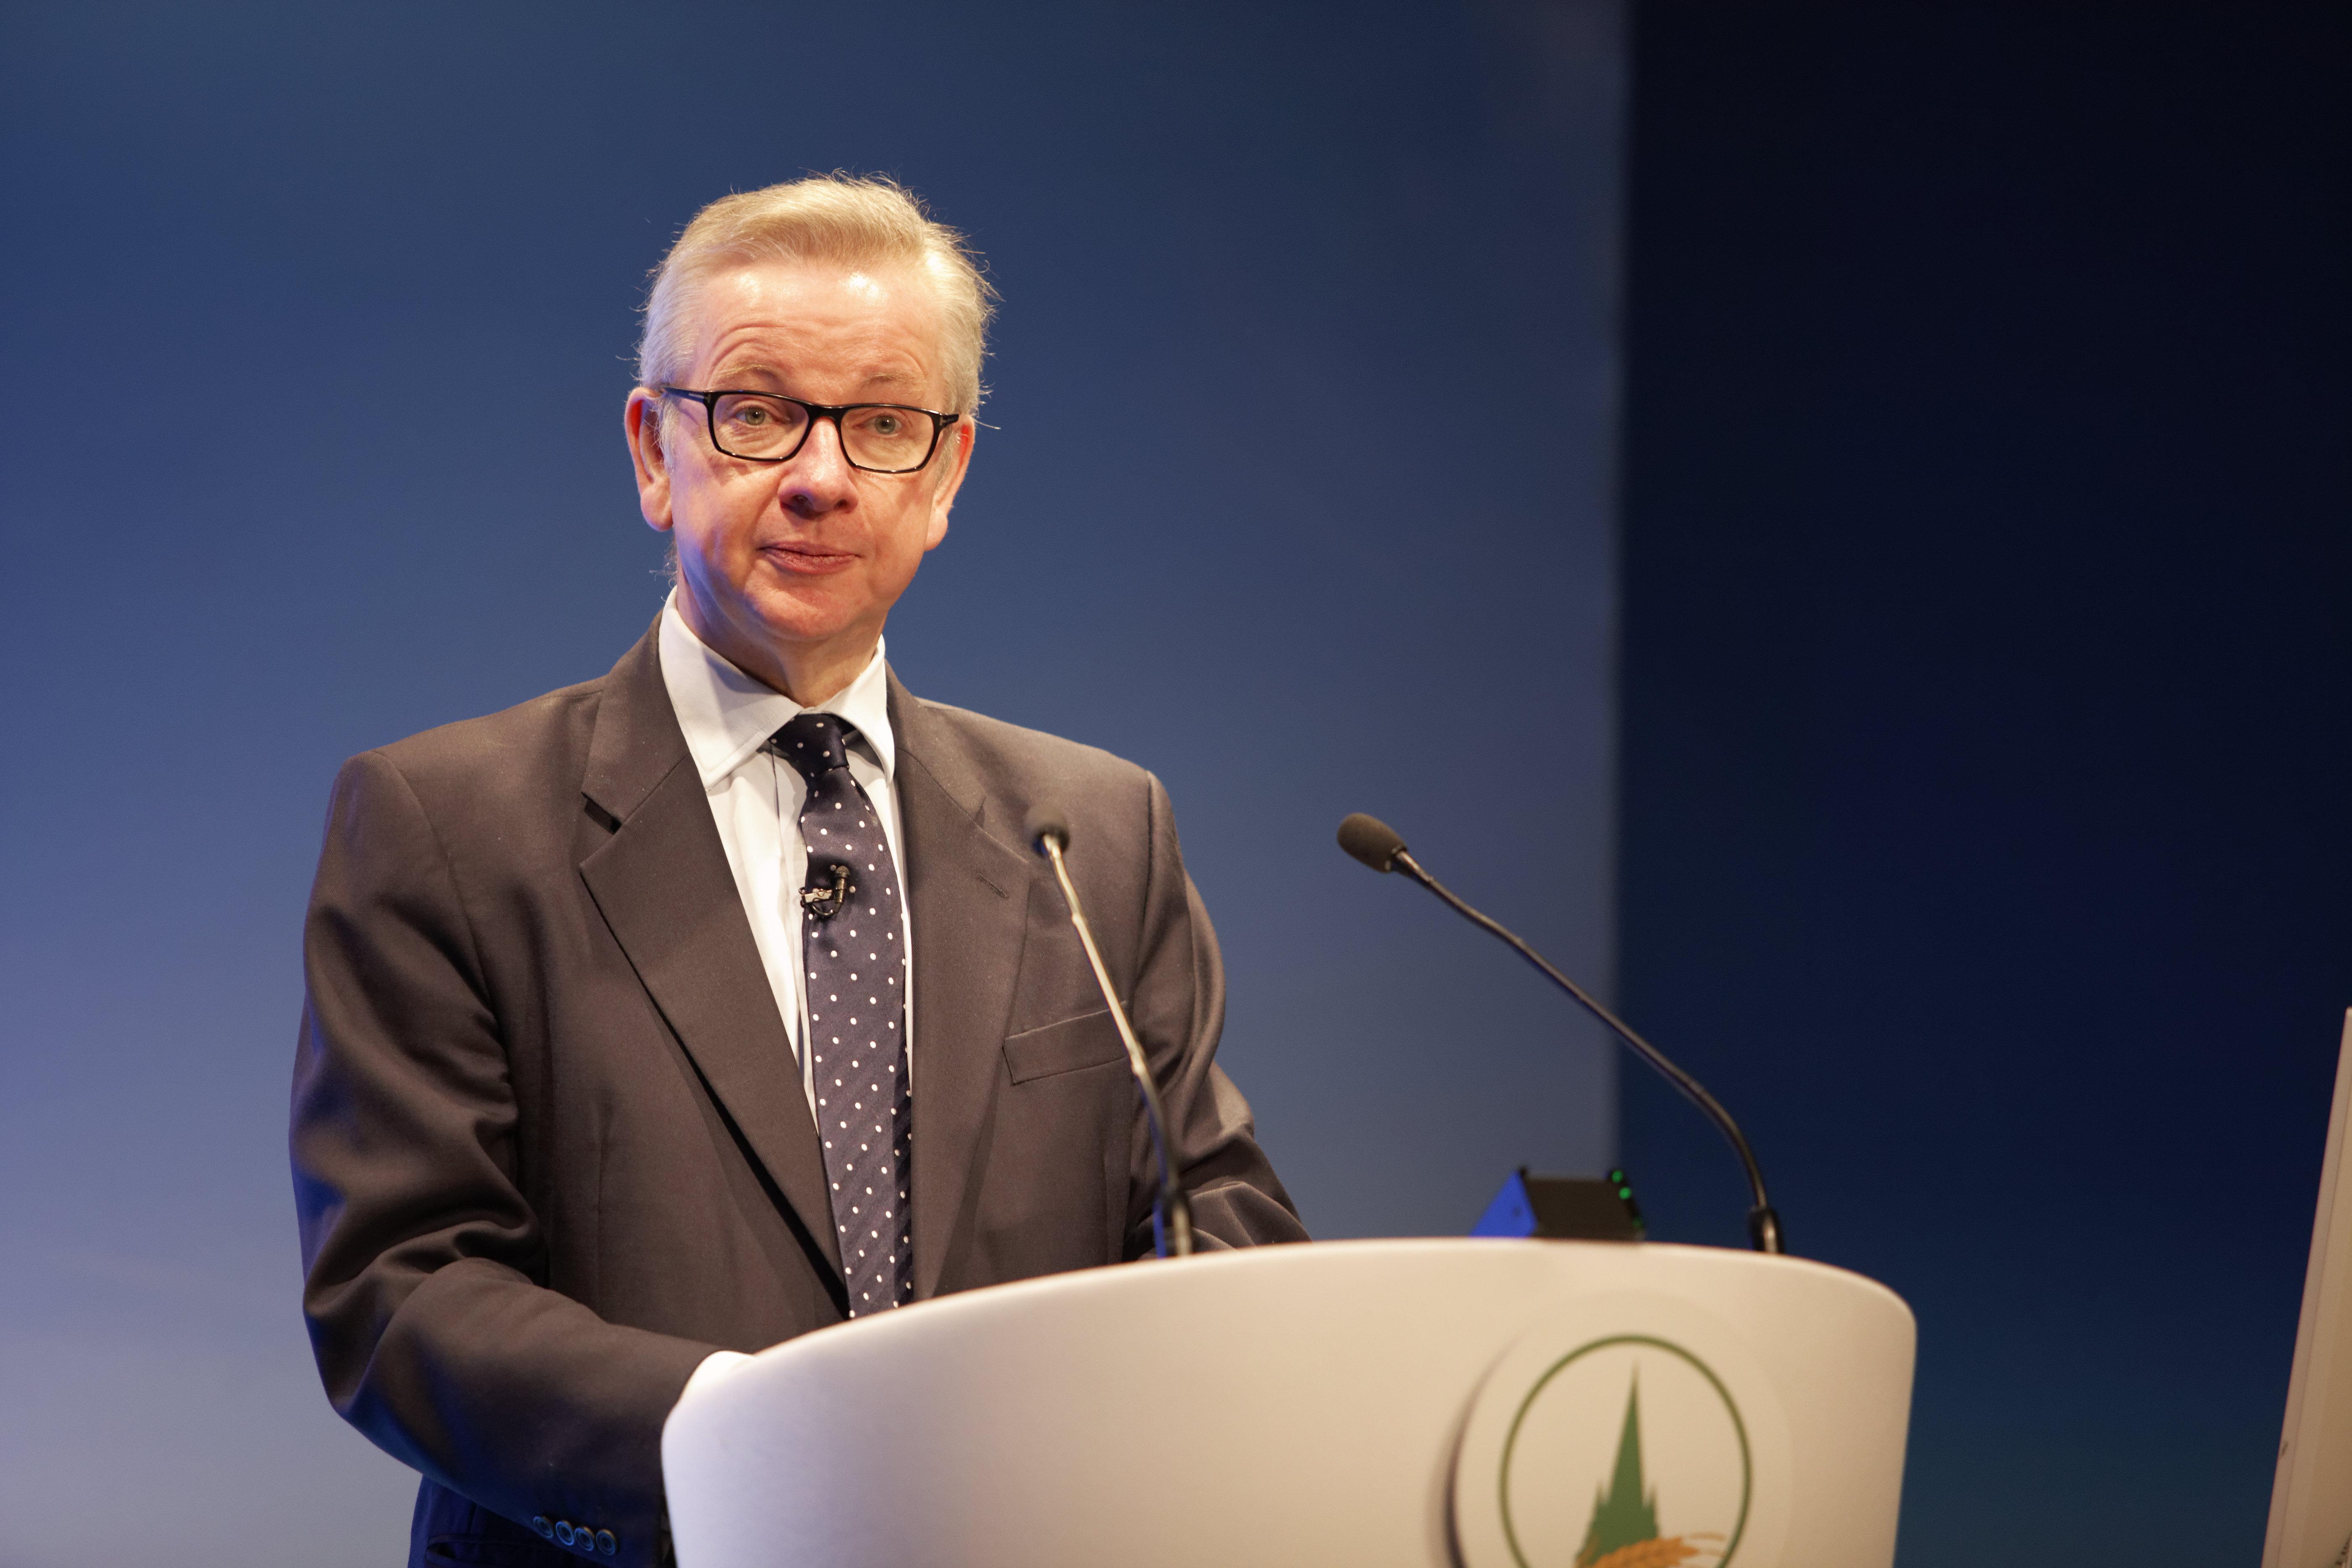 Michael Gove spoke at the Oxford Farming Conference